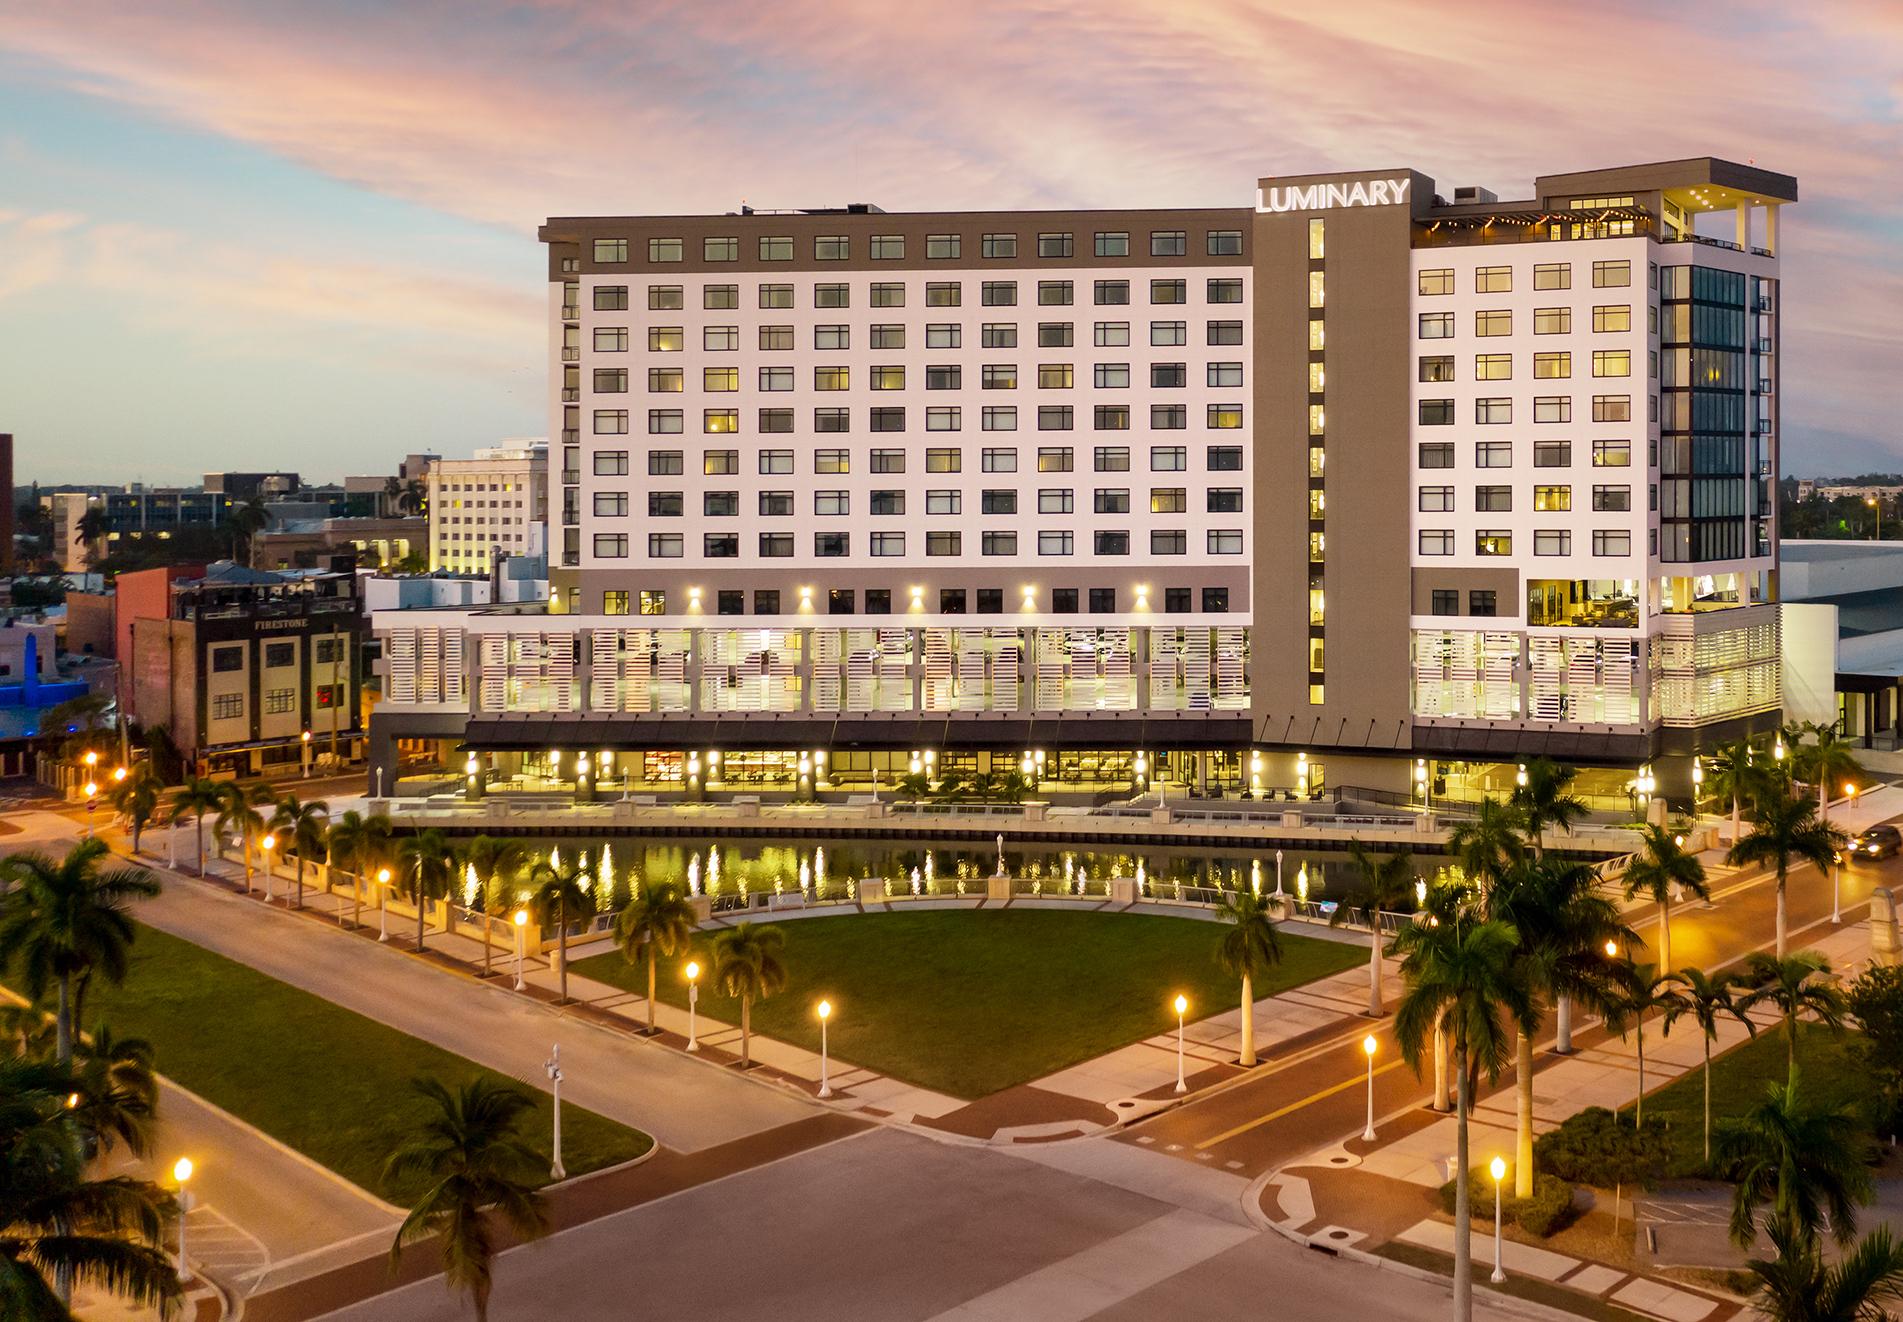 Package_2 option exterior Luminary Hotel - Exterior - Aerial Hero Dawn crop